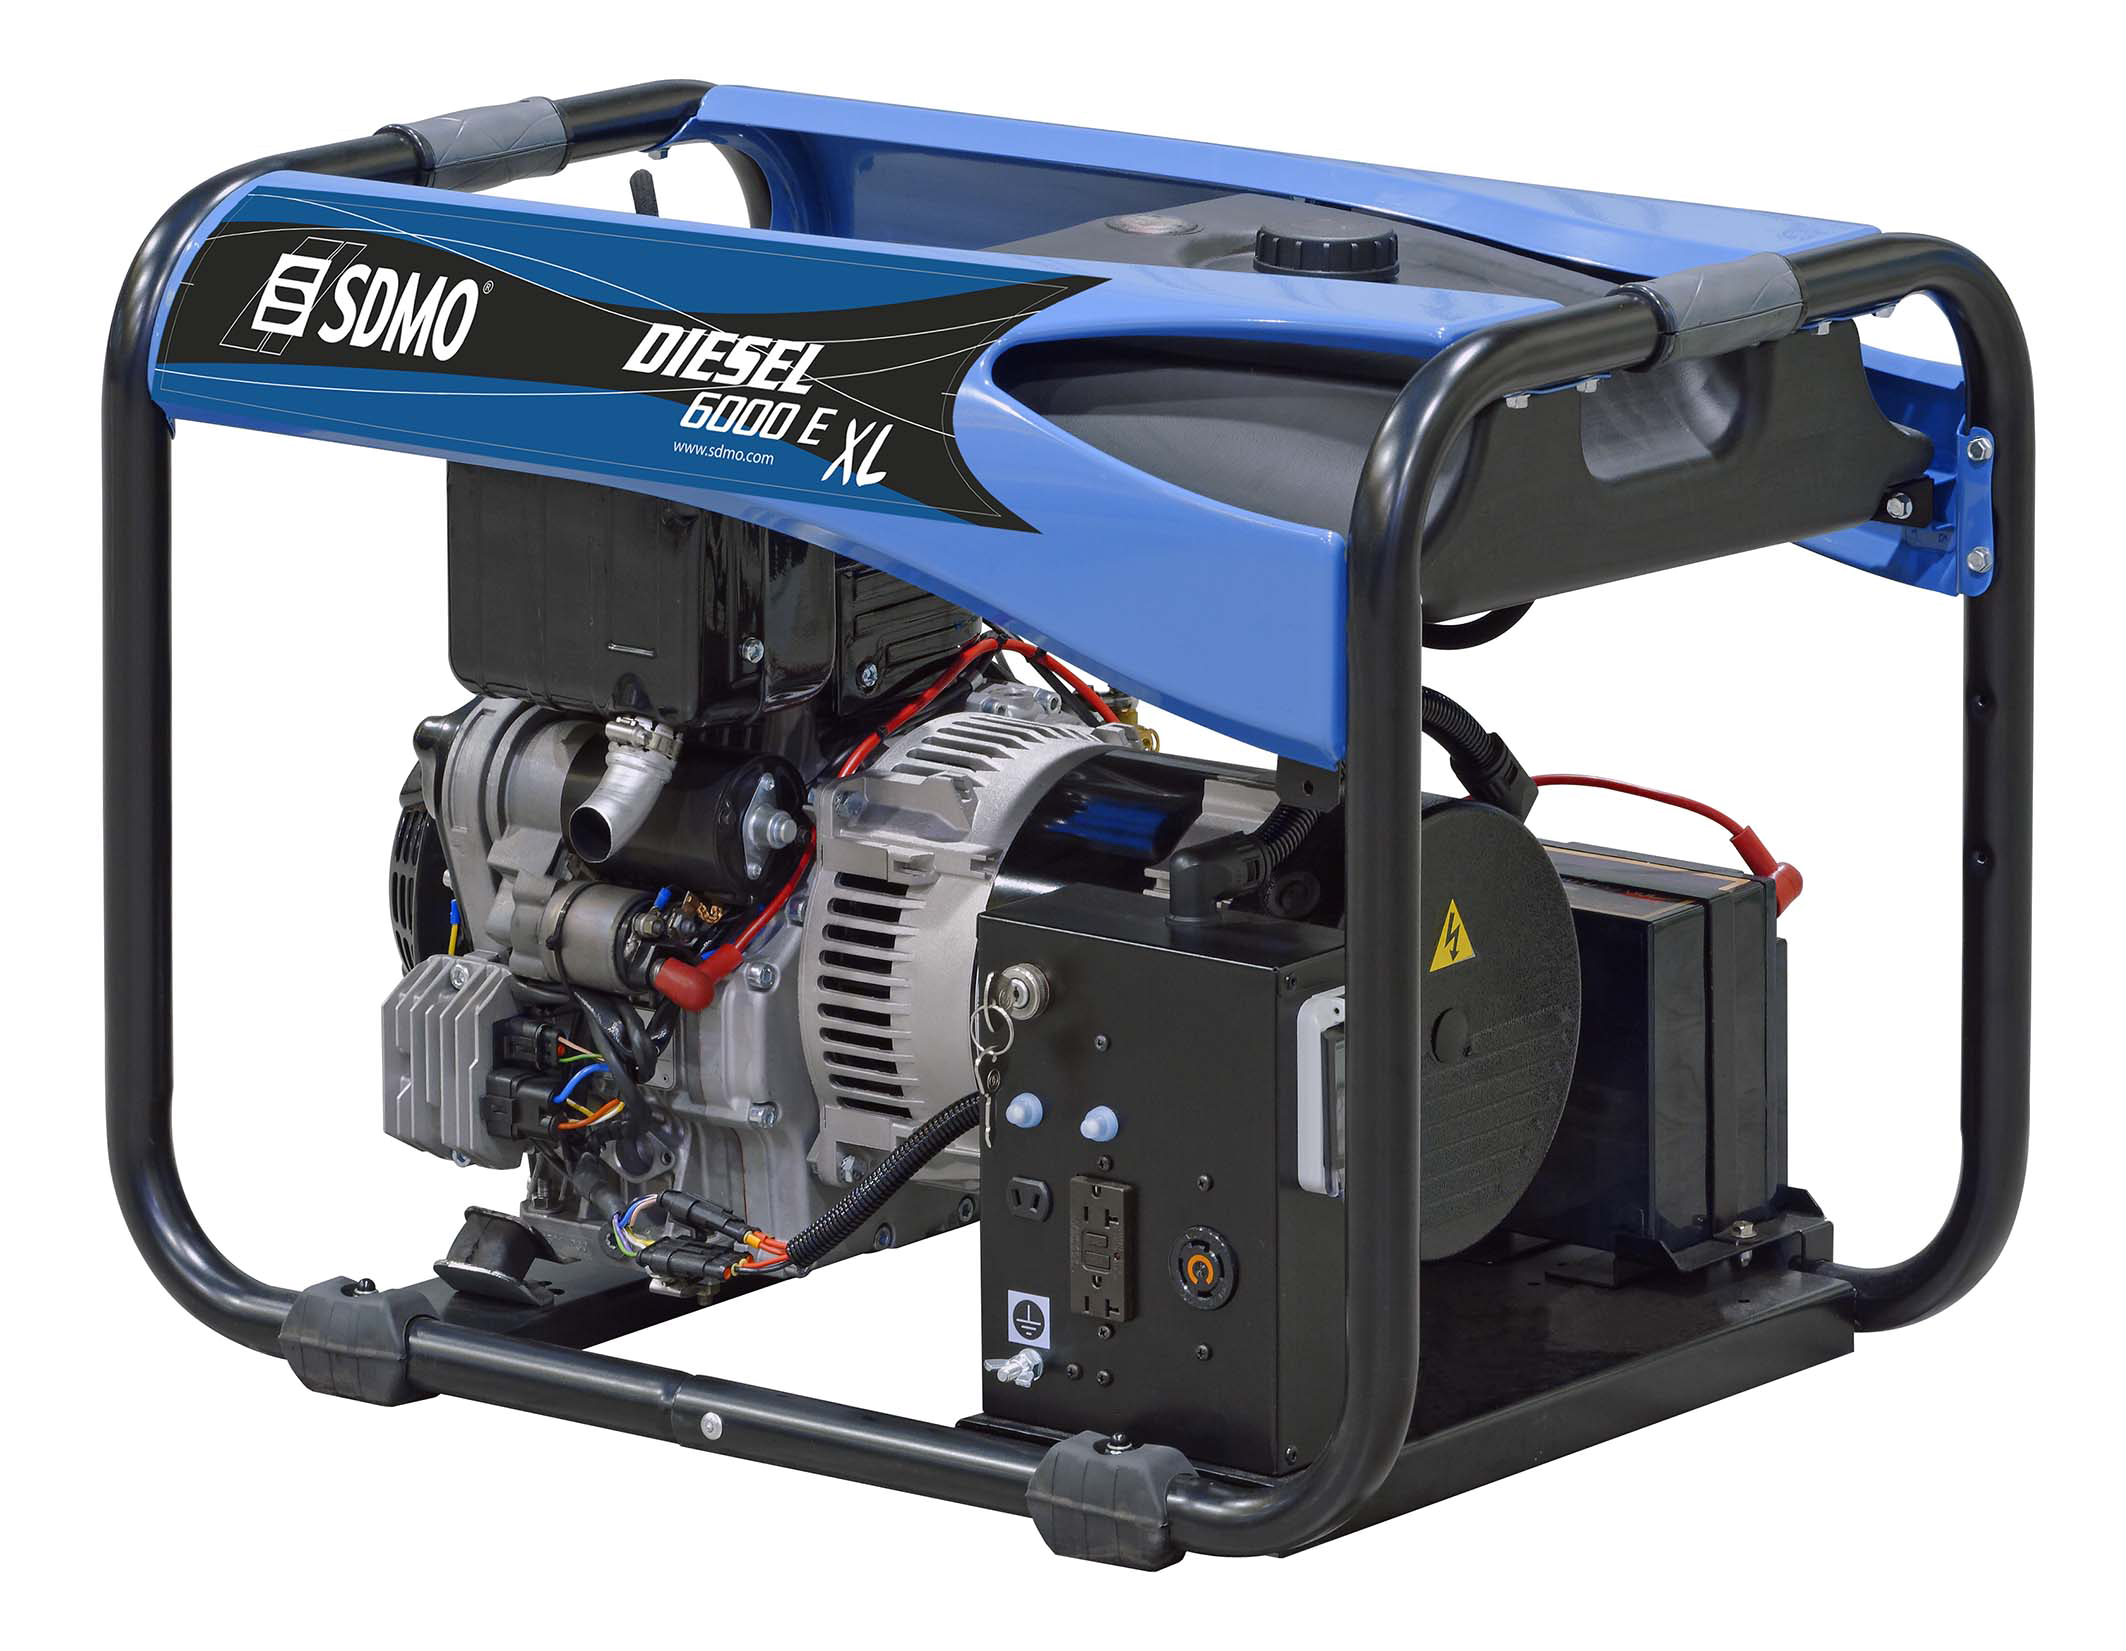 Generators Electrical Generators Portable Generators